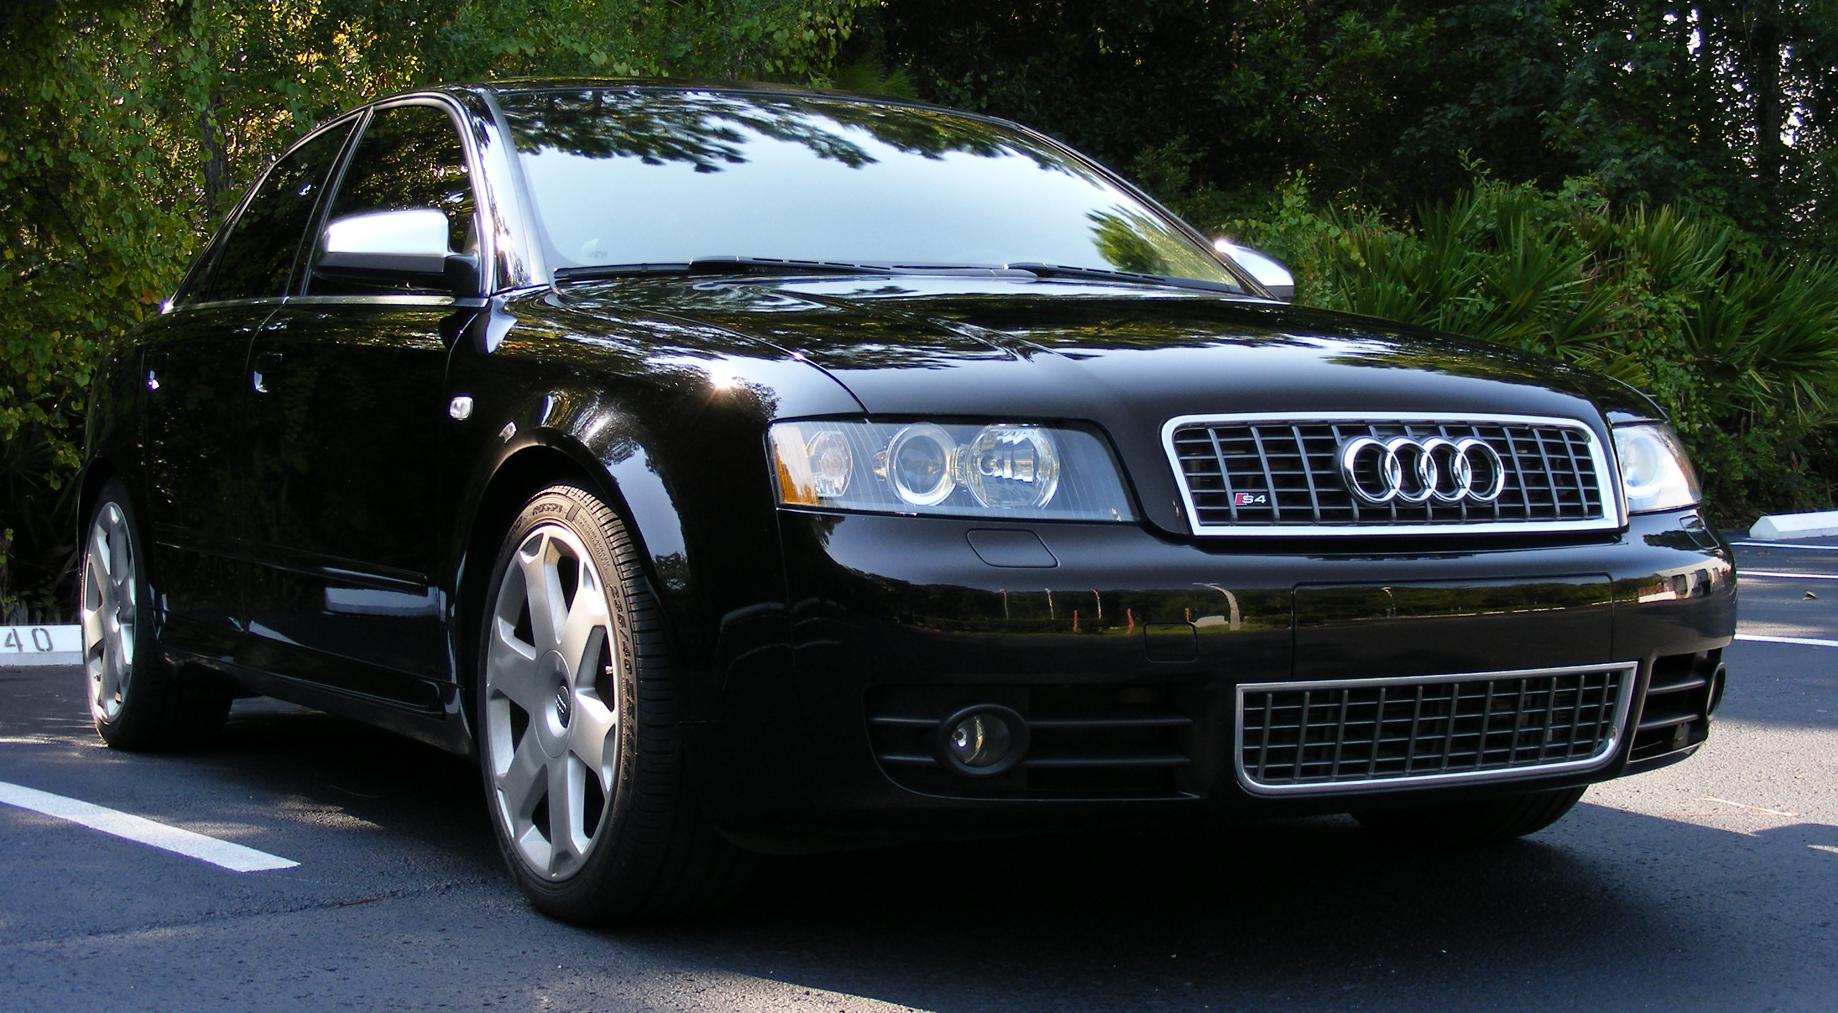 File:Audi b6 s4 2005 celtic12112.png - Wikimedia Commons